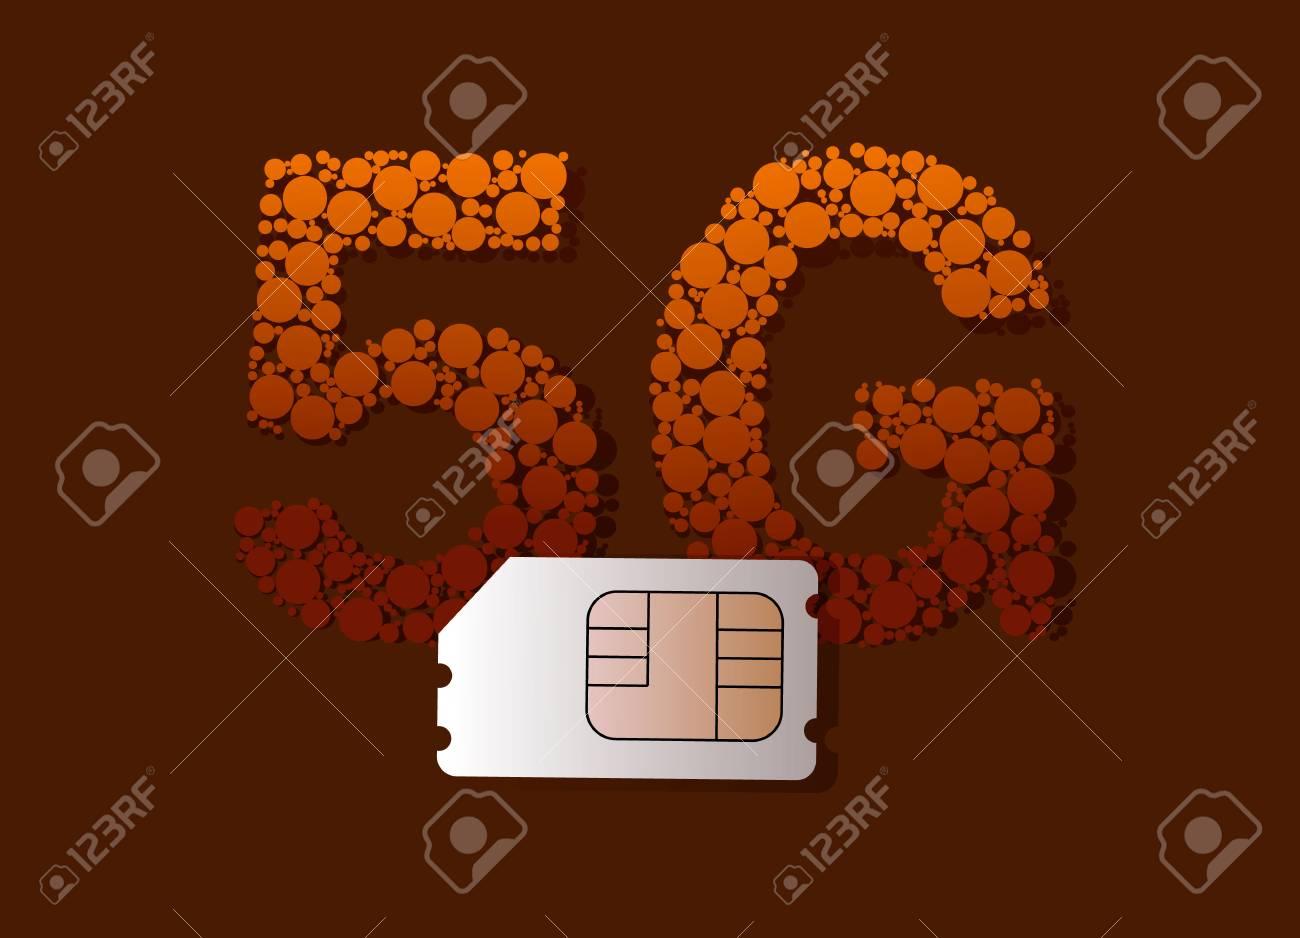 5g Business. 5G SIM Card, High-speed Mobile Internet Royalty Free ...